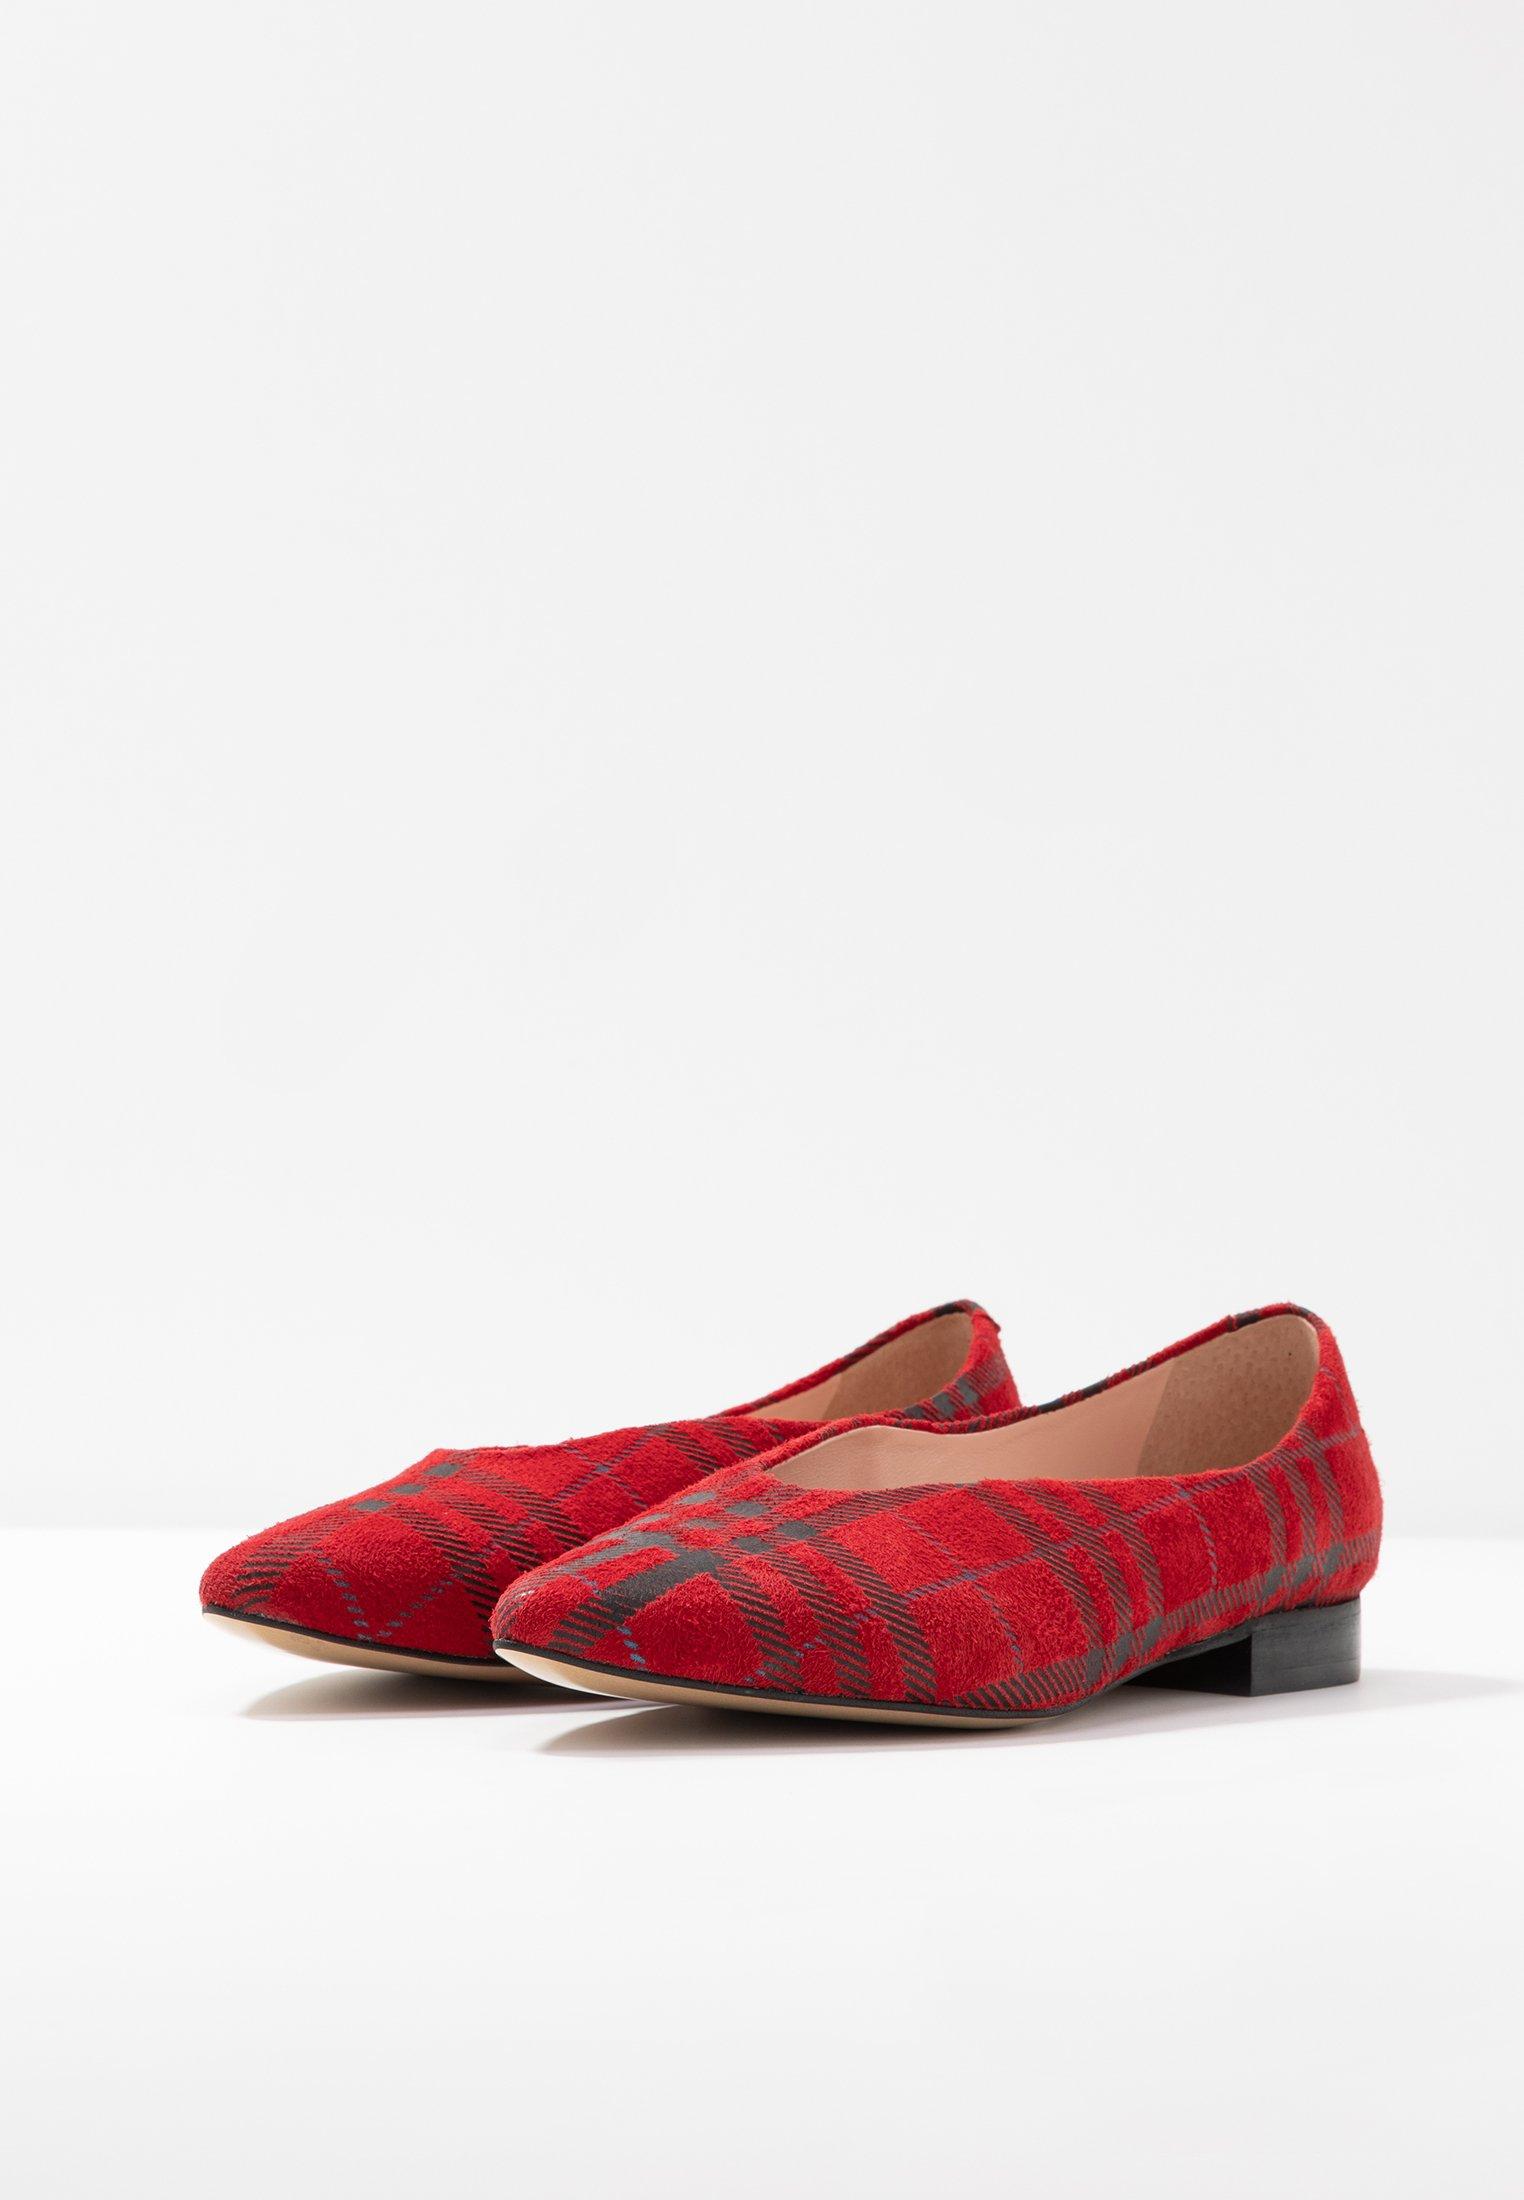 L37 Bluebell - Ballerina's Red/black 2X6tHrdx